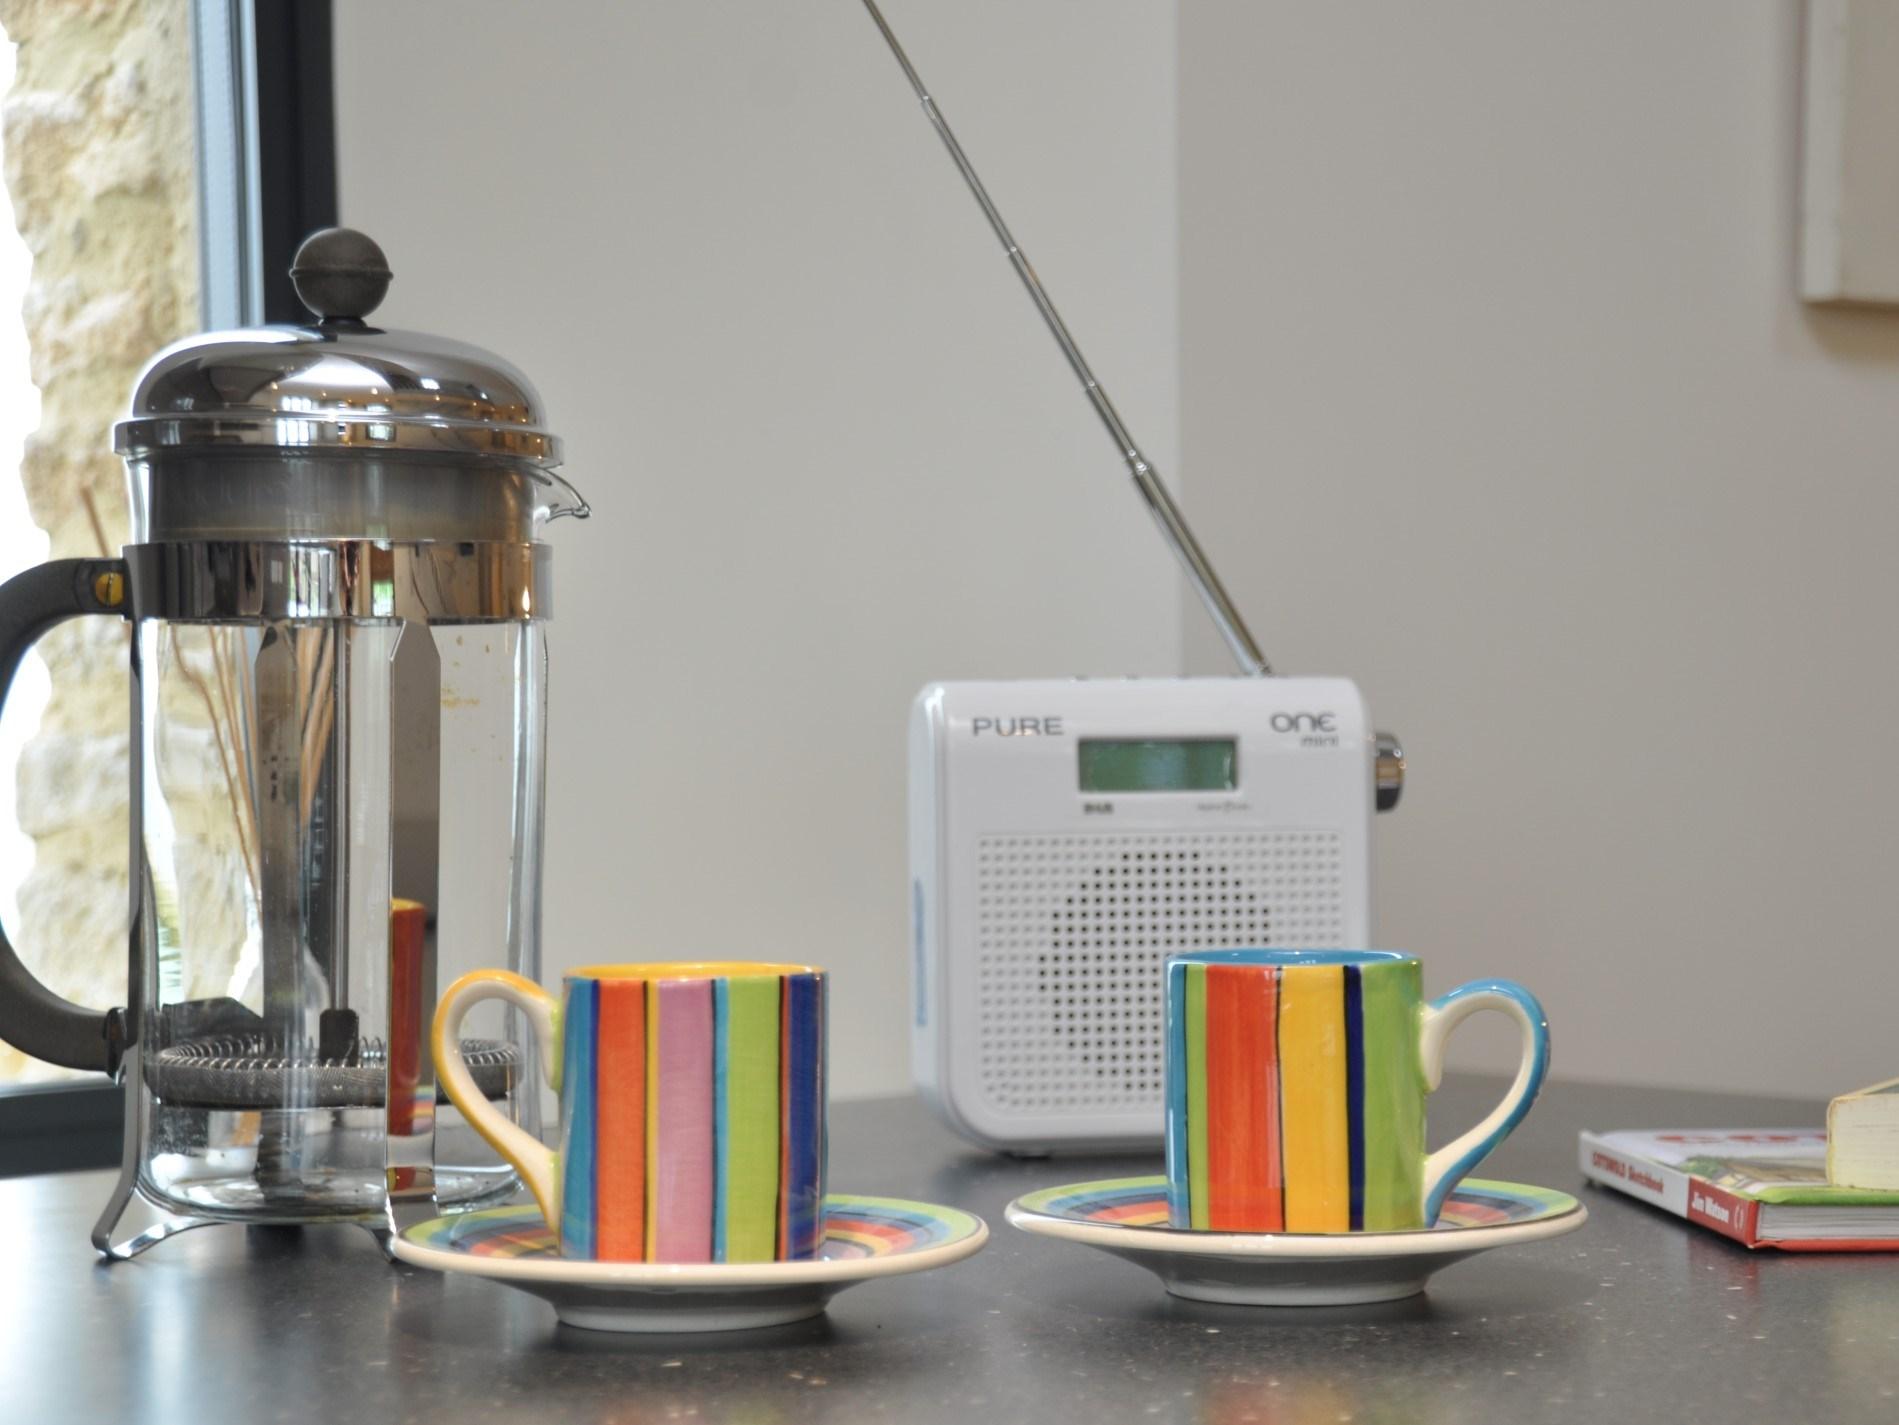 Morning coffee